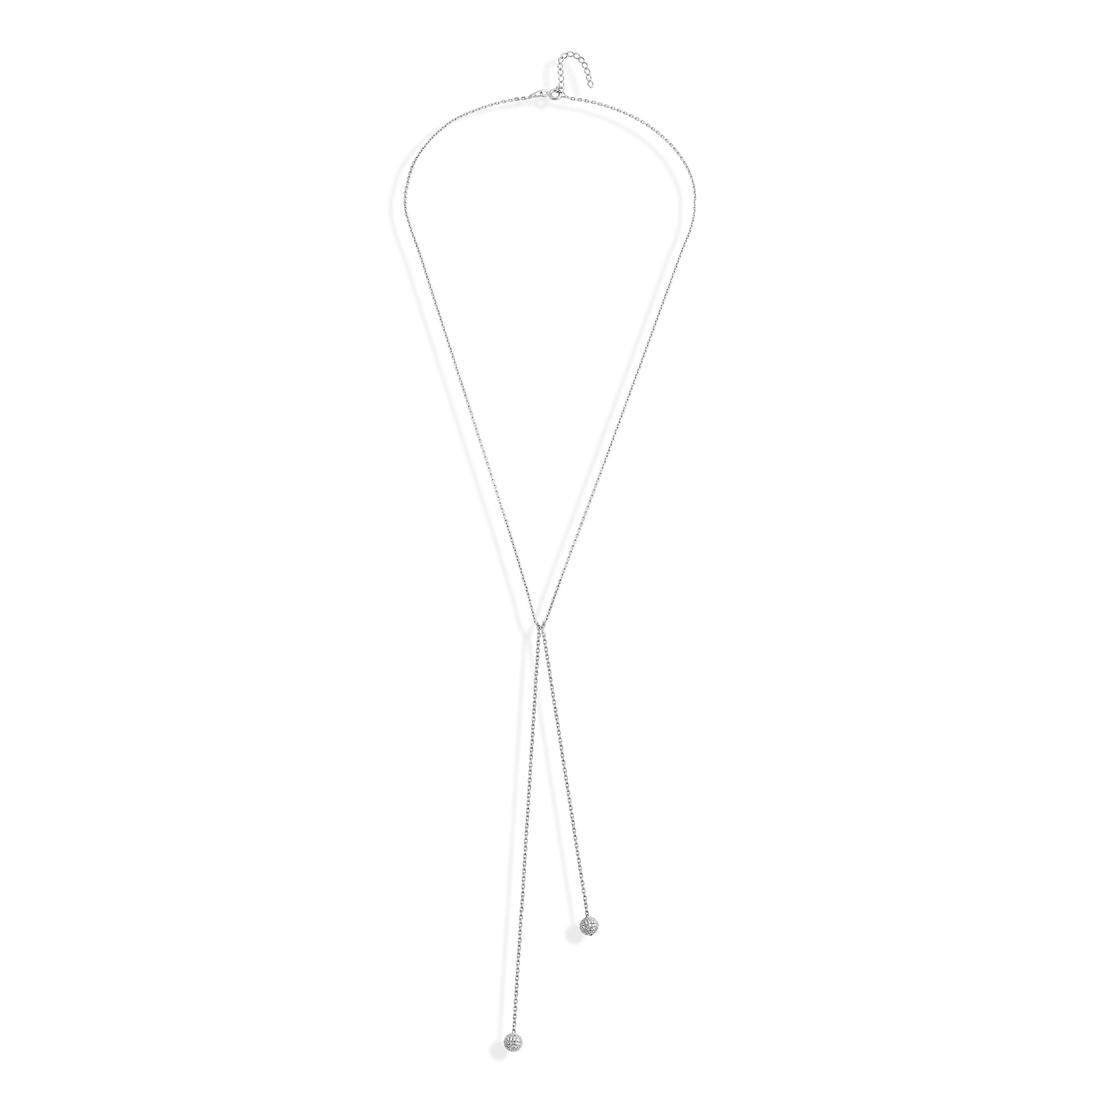 Pendulum Silver Necklace - High Street Jewelry